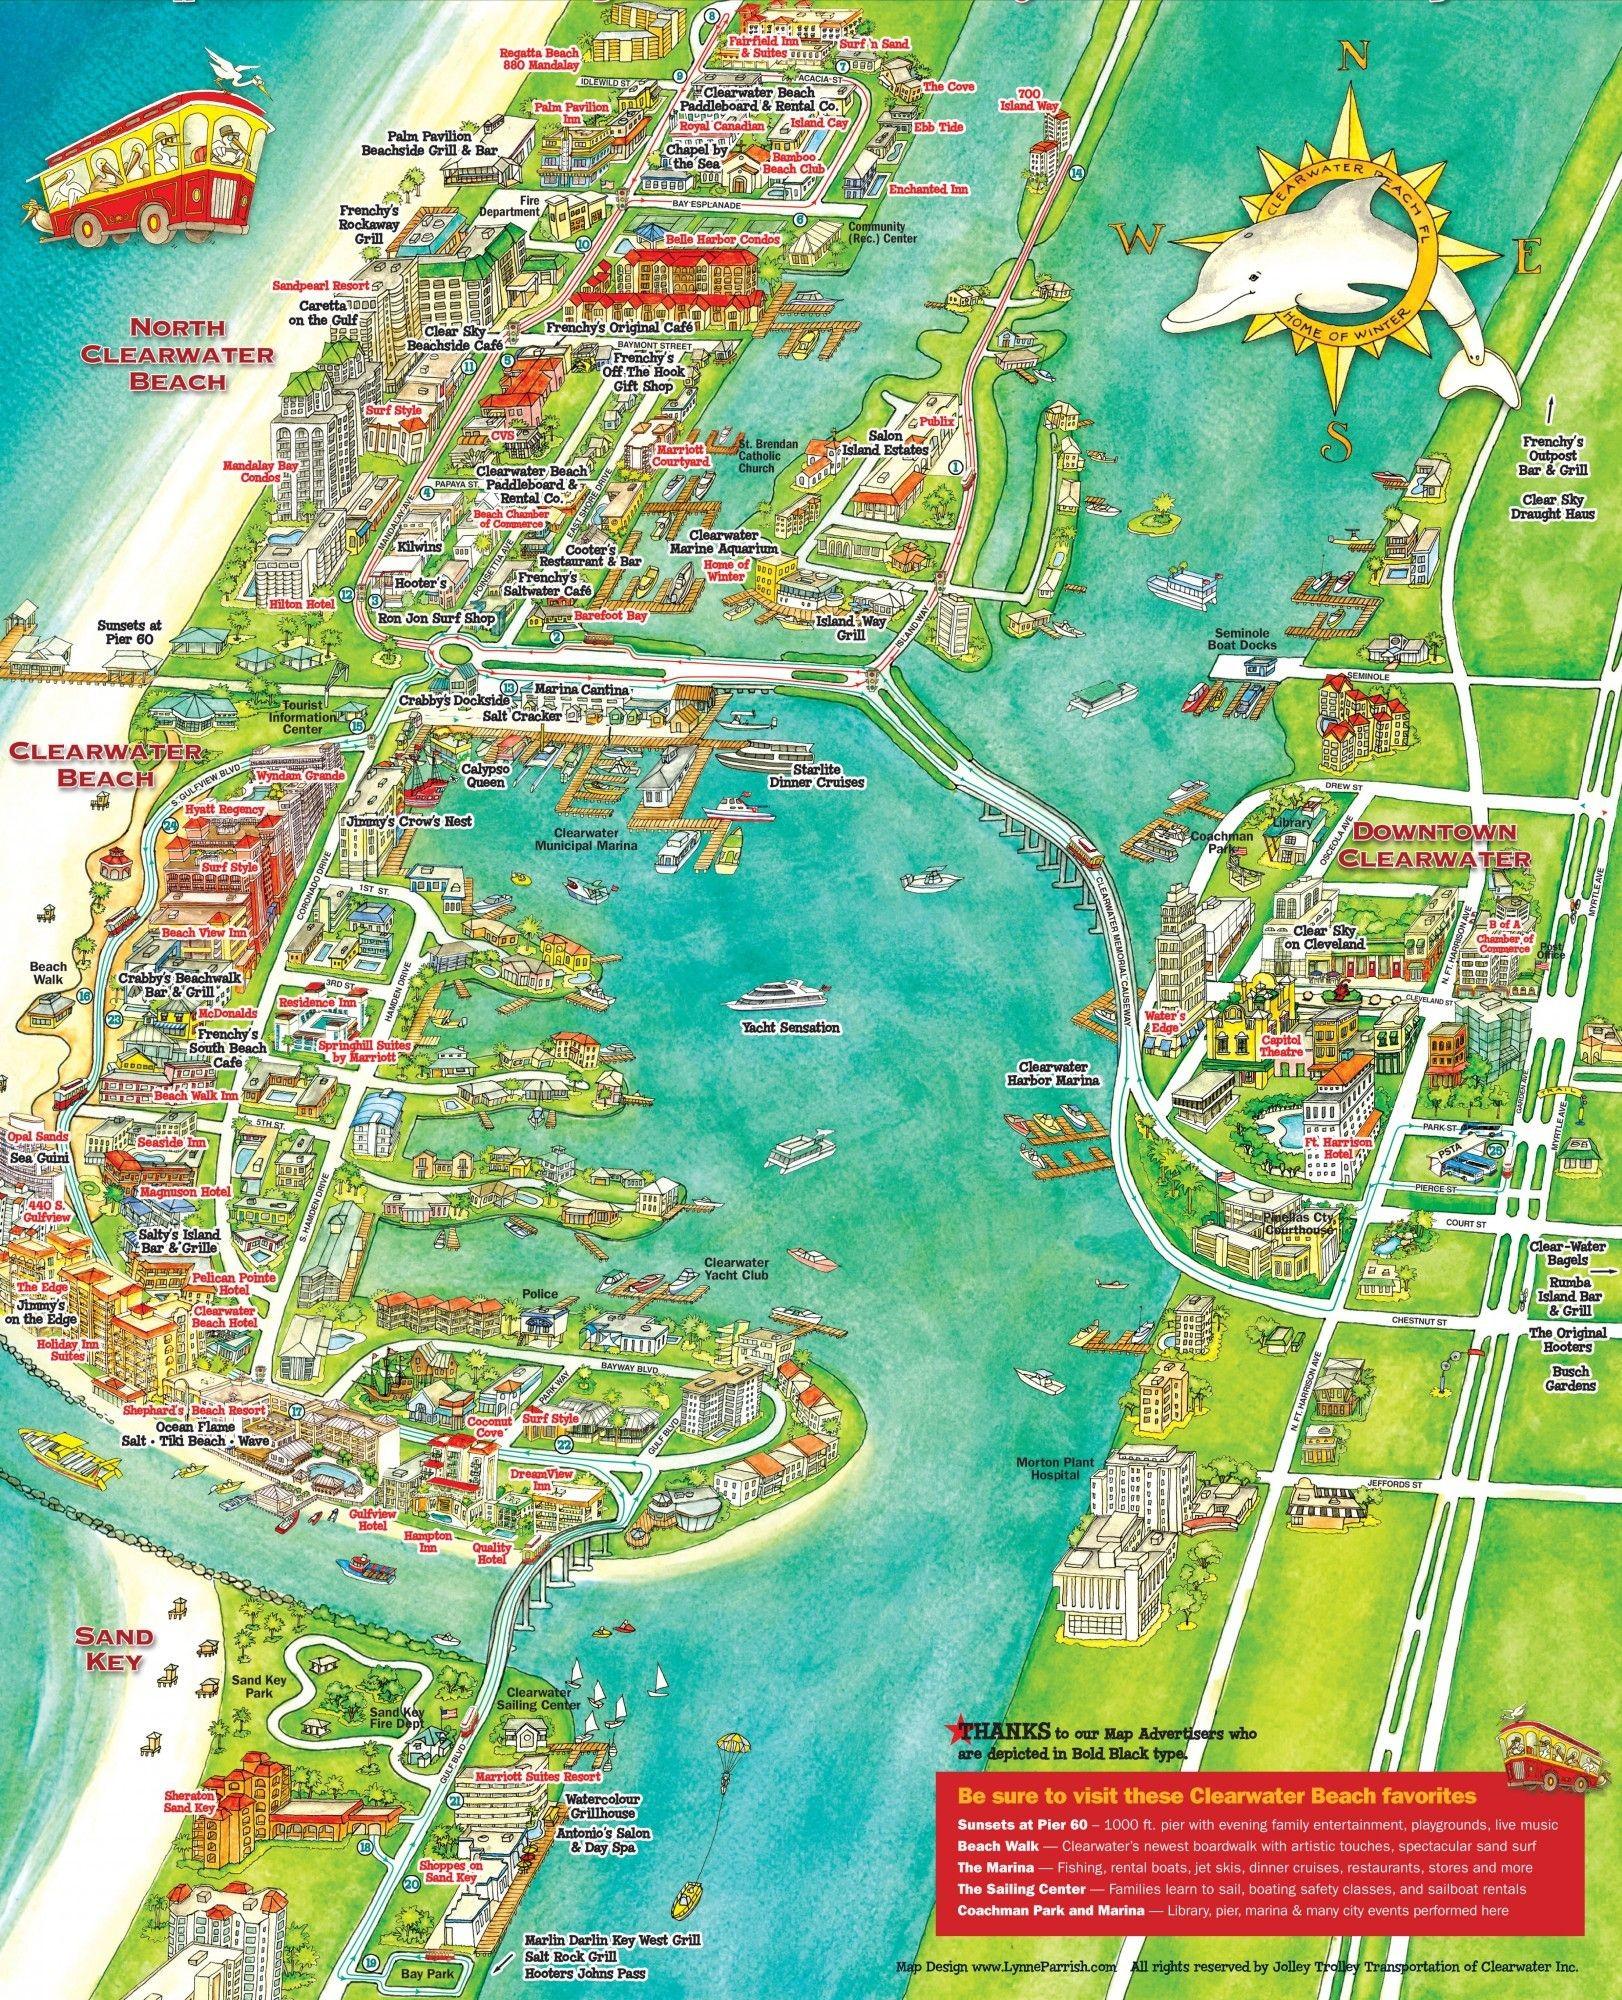 Map Of Florida Beaches Near Tampa 1 | Globalsupportinitiative - Map Of Tampa Florida Beaches